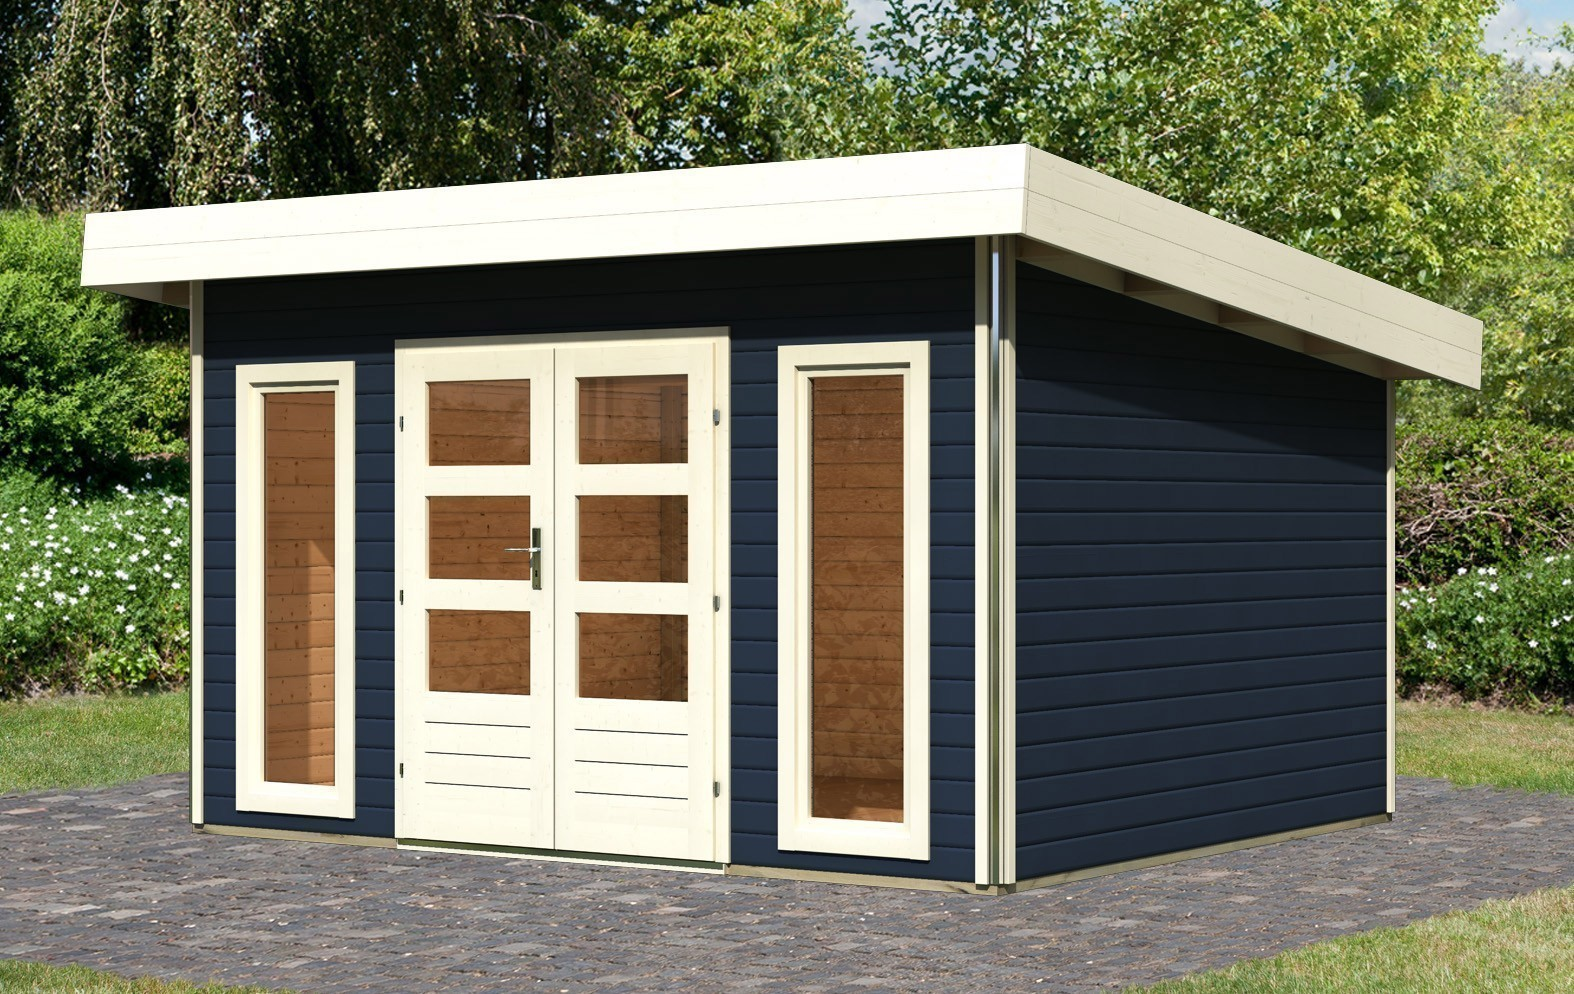 karibu gartenhaus 40mm tecklenburg 1 grau 418x357cm bei. Black Bedroom Furniture Sets. Home Design Ideas